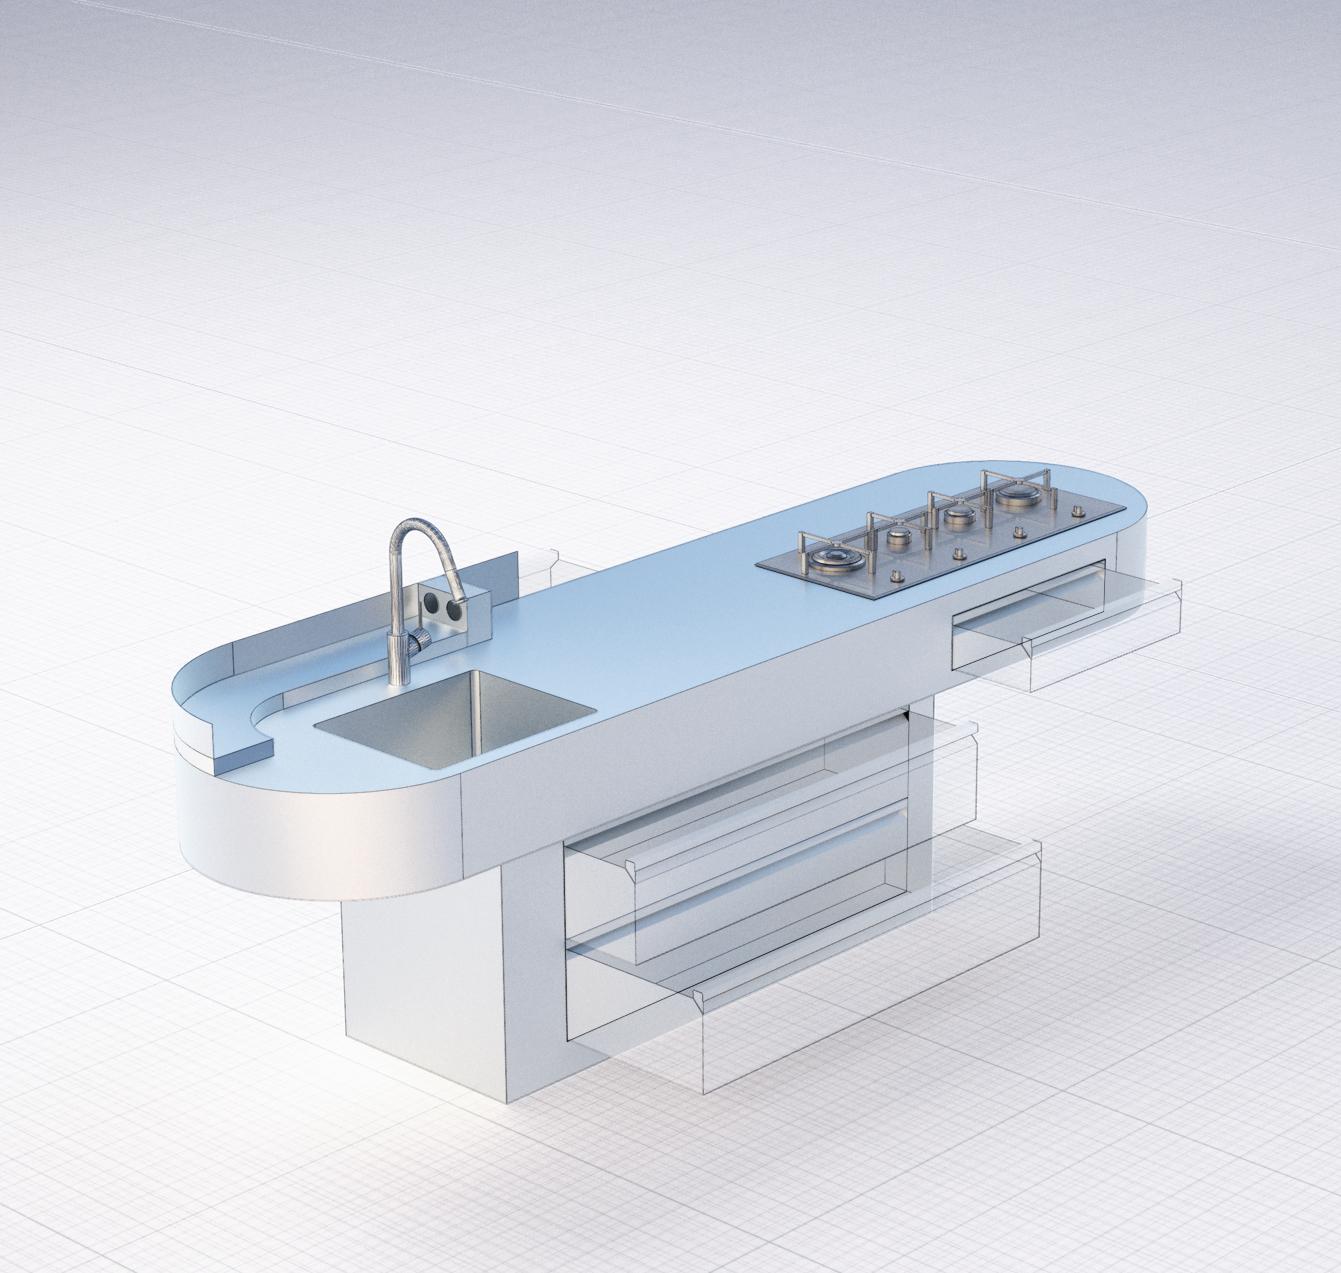 maki-ortner-furniture-kitchen-clara-render-01